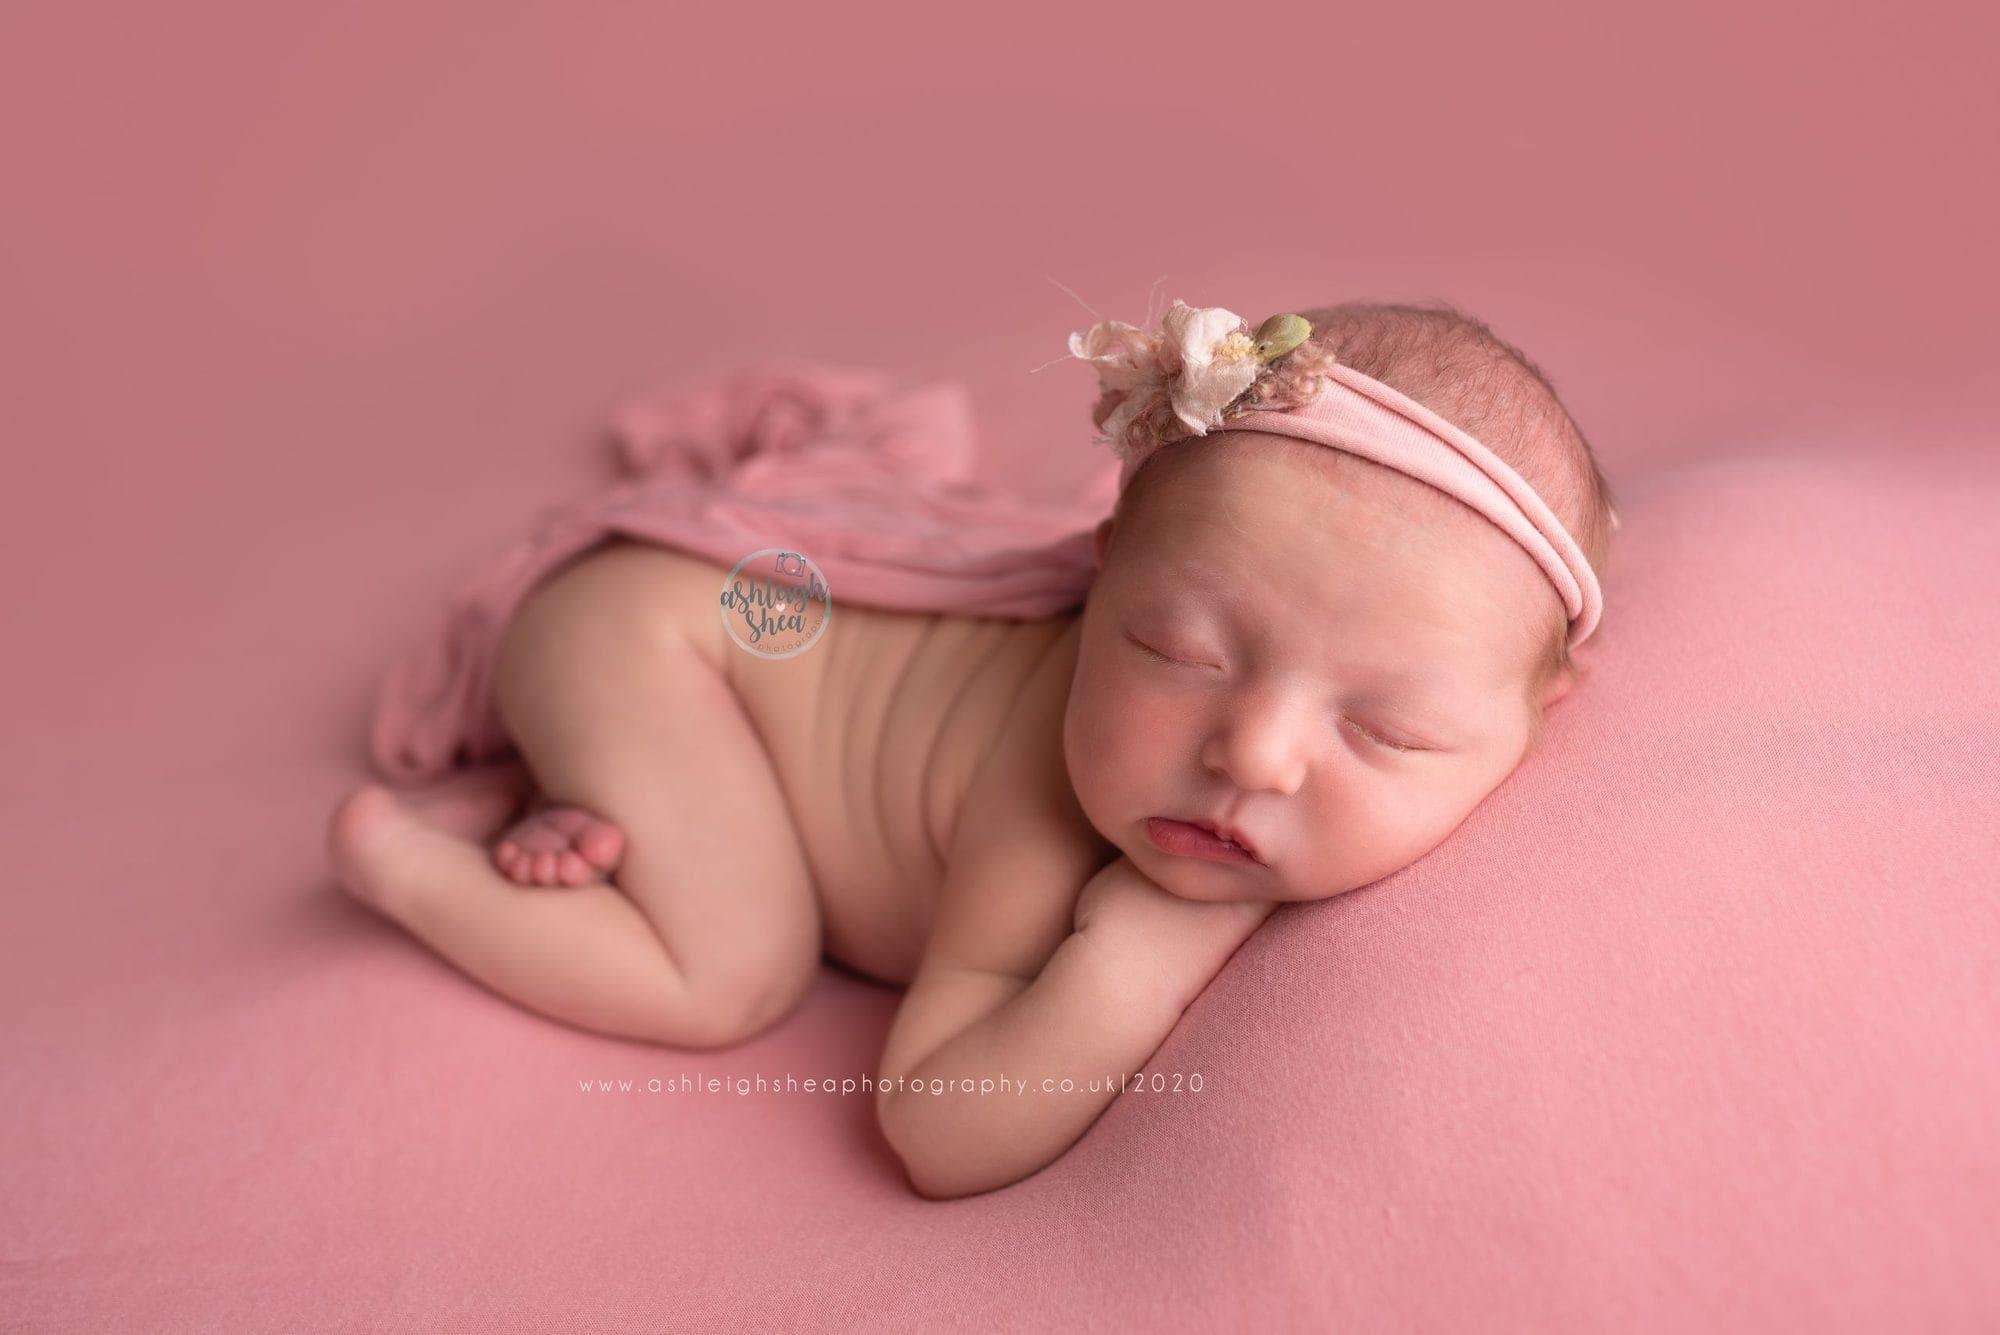 Baby Girl newborn photo, Bromley, Kent, Ashleigh Shea Photography,